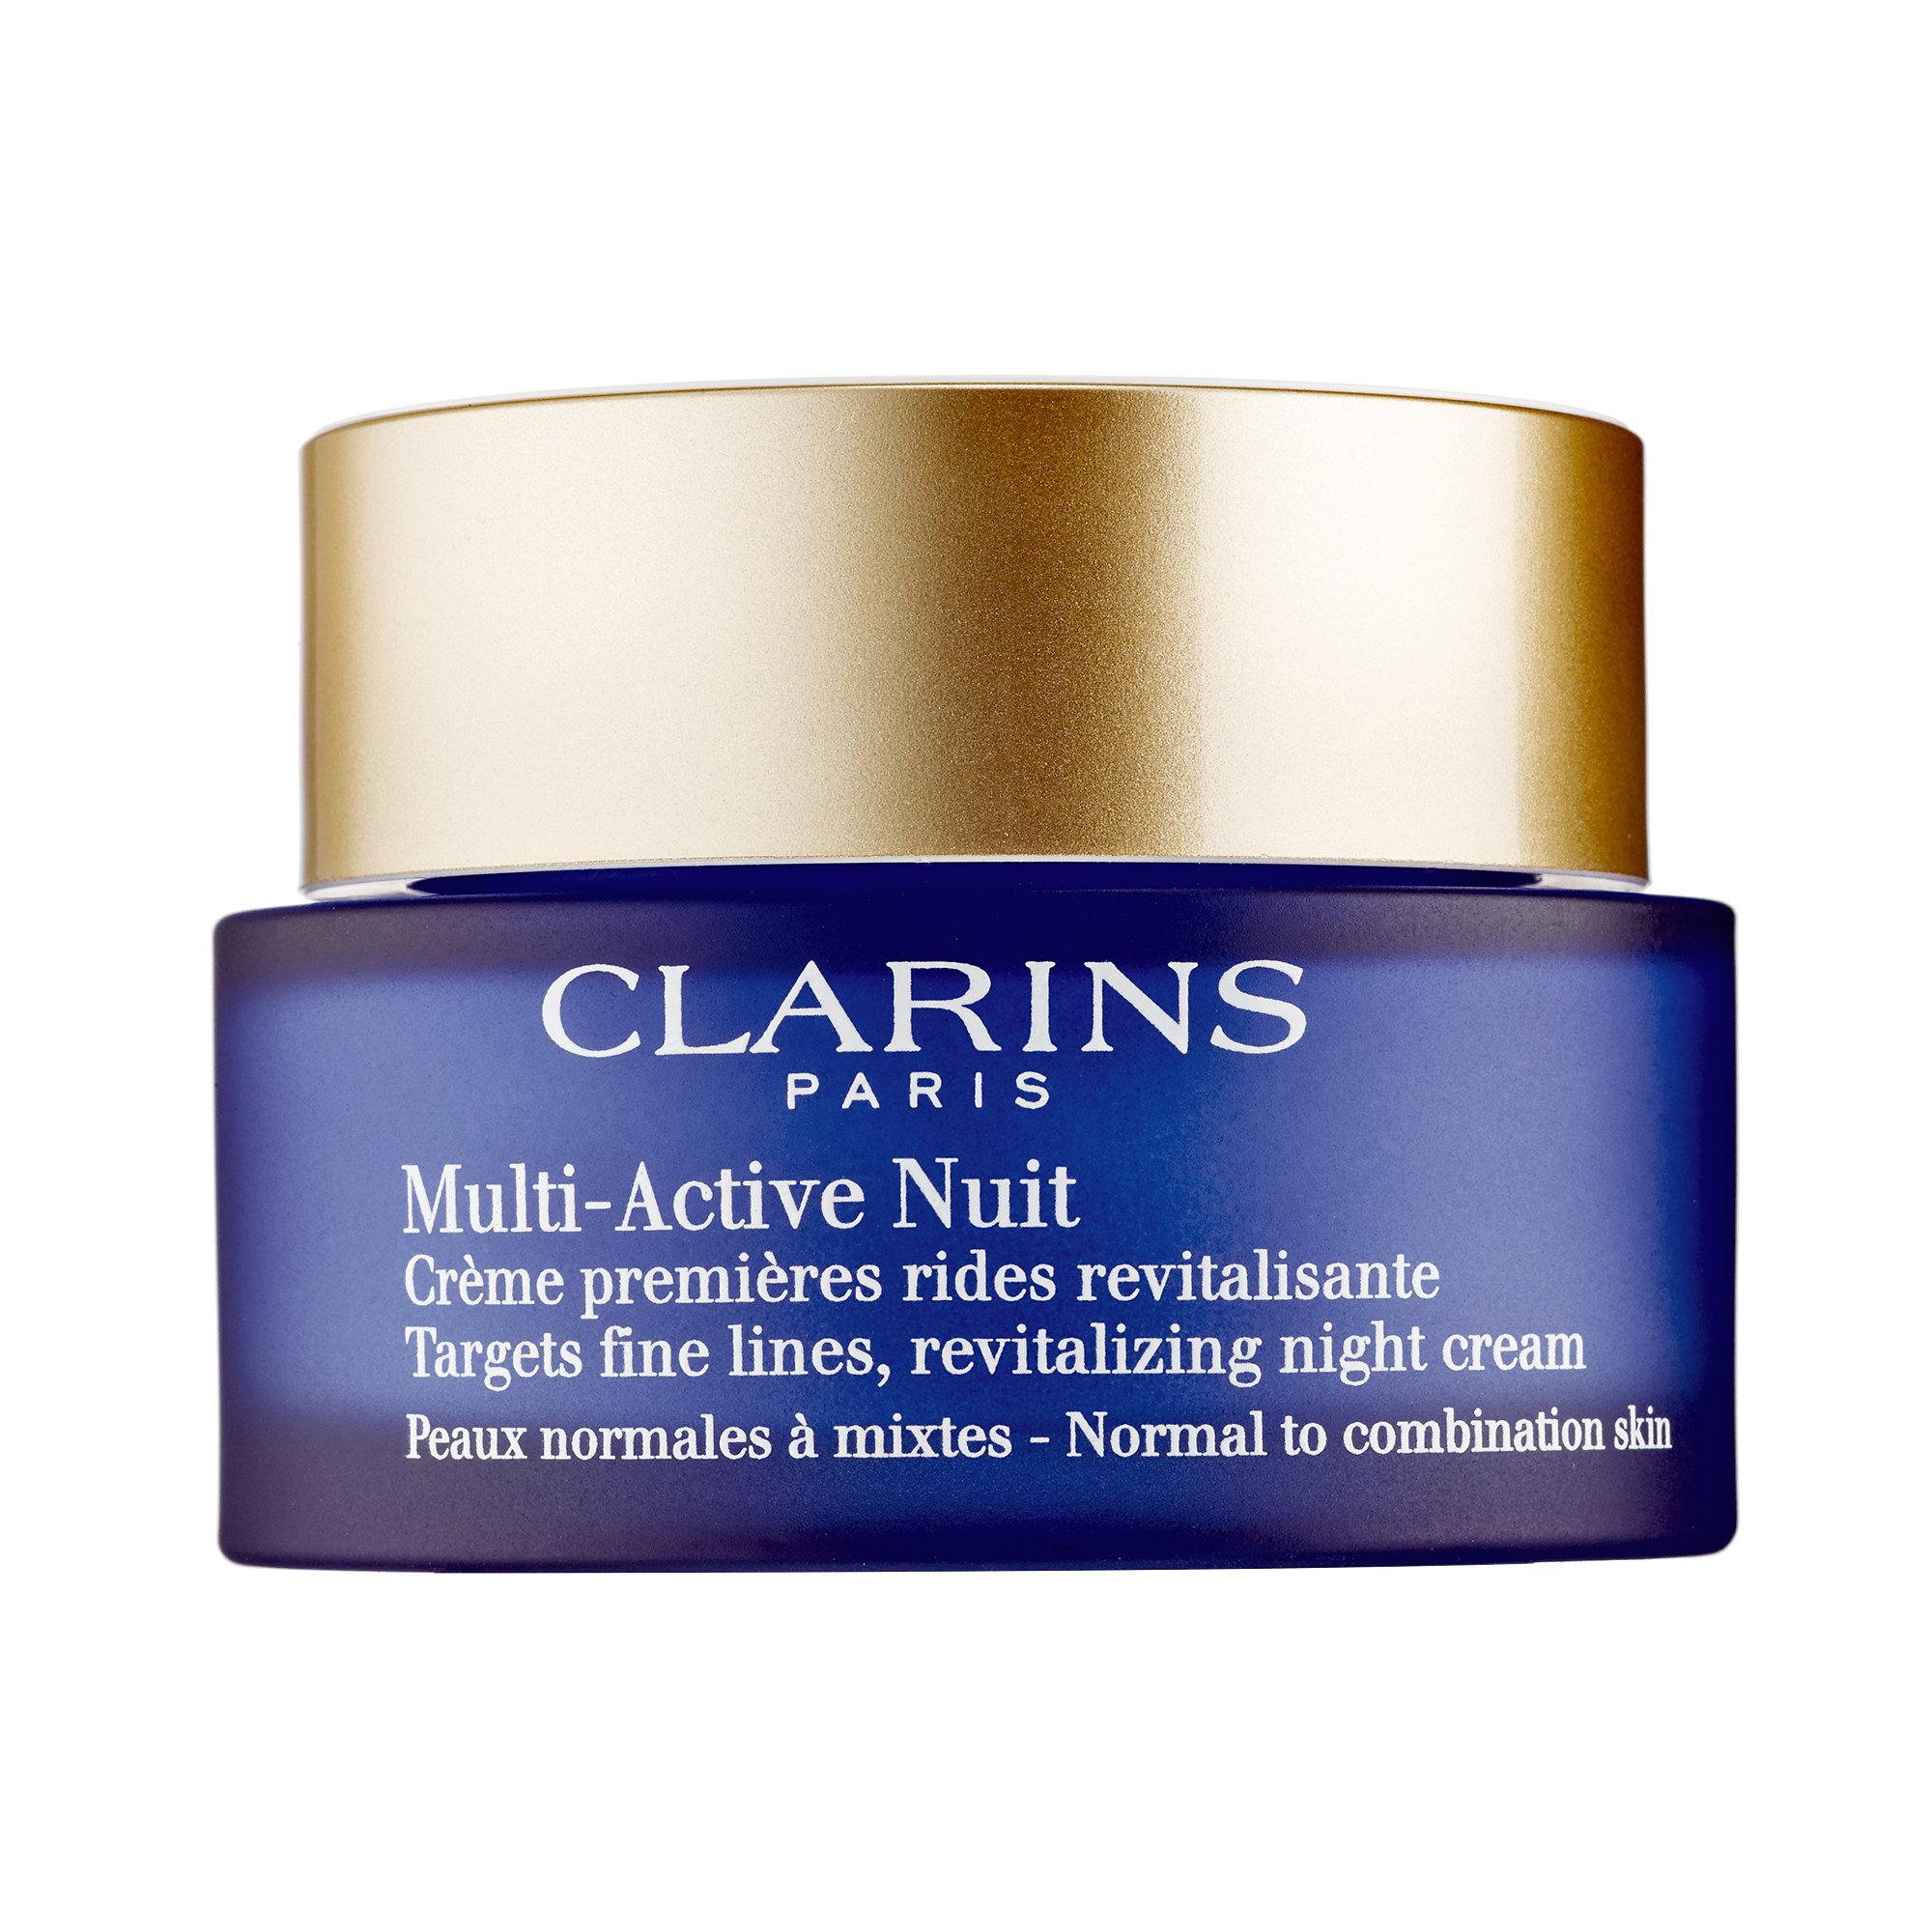 CLARINS   Multi-Active Night Cream - Normal to Combination Skin;   $57